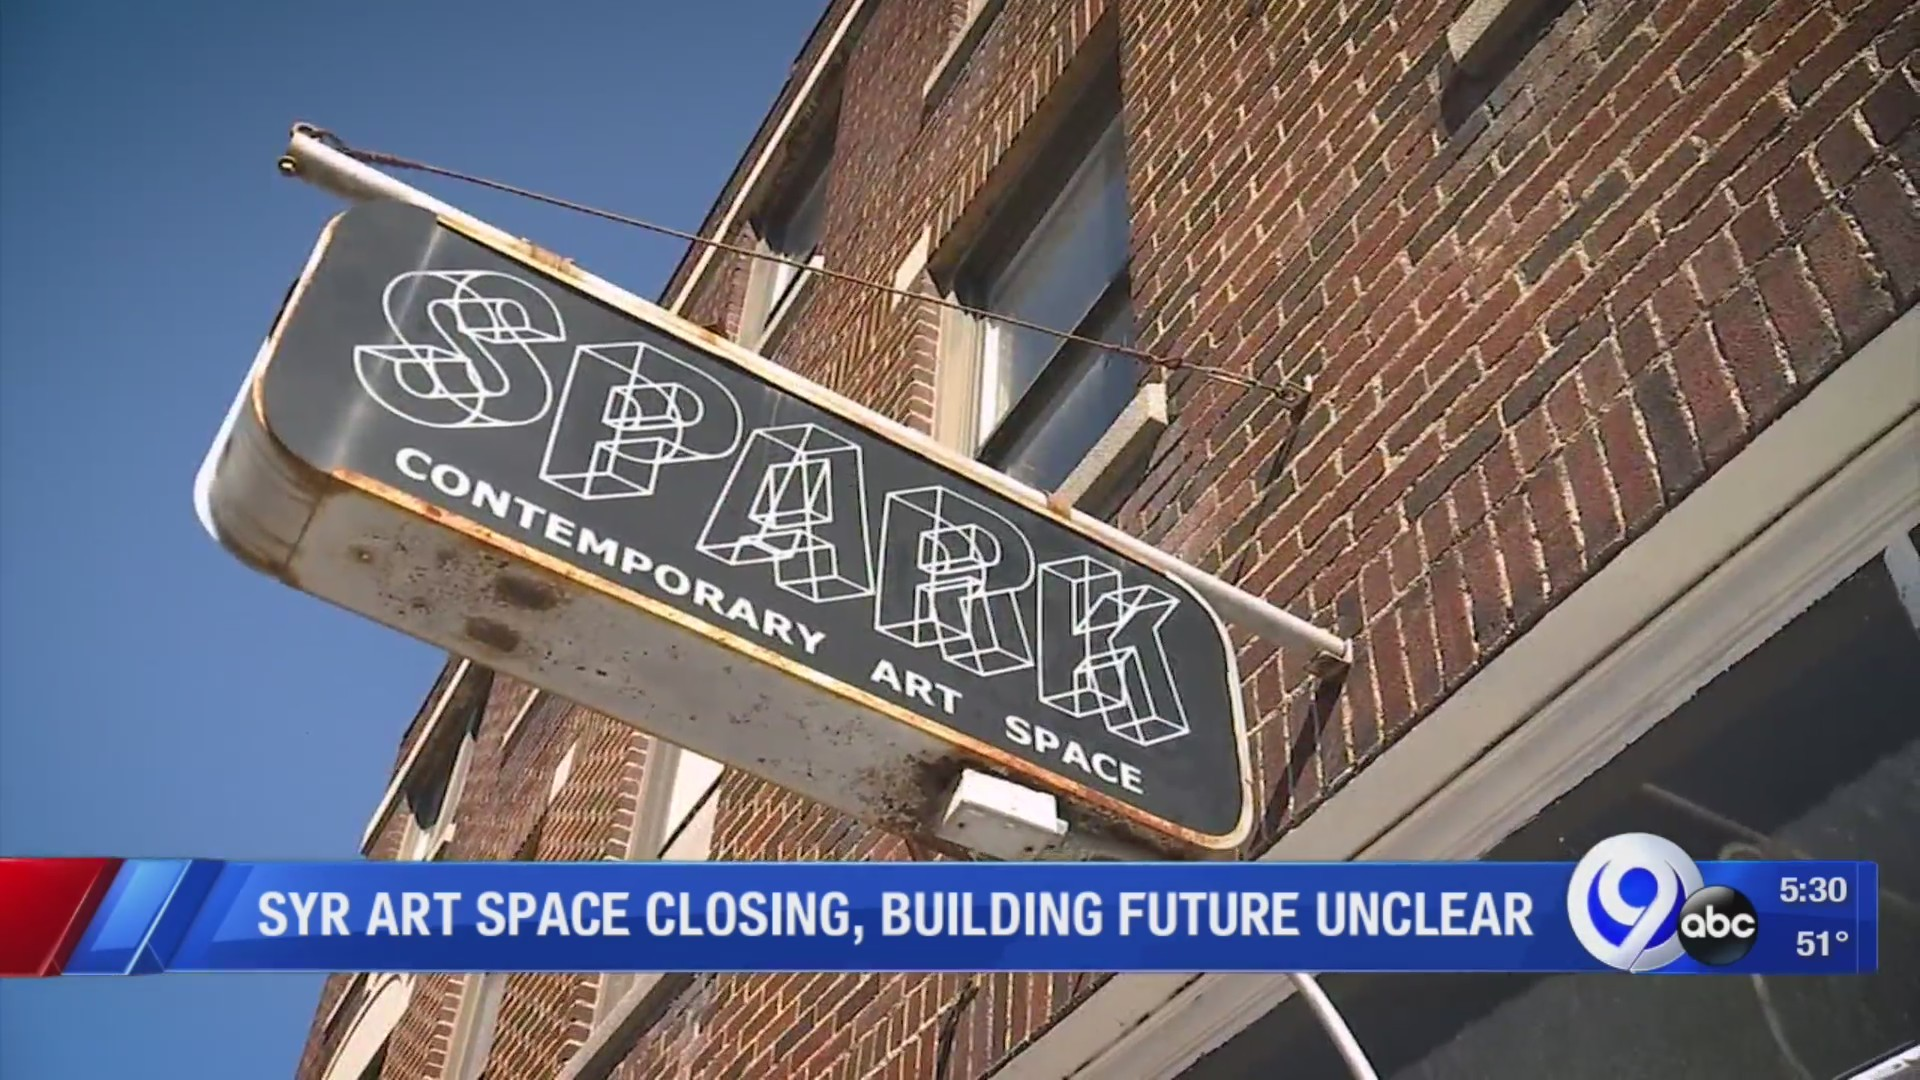 Syracuse_Art_Space_Closing__Building_Fut_0_20190416214909